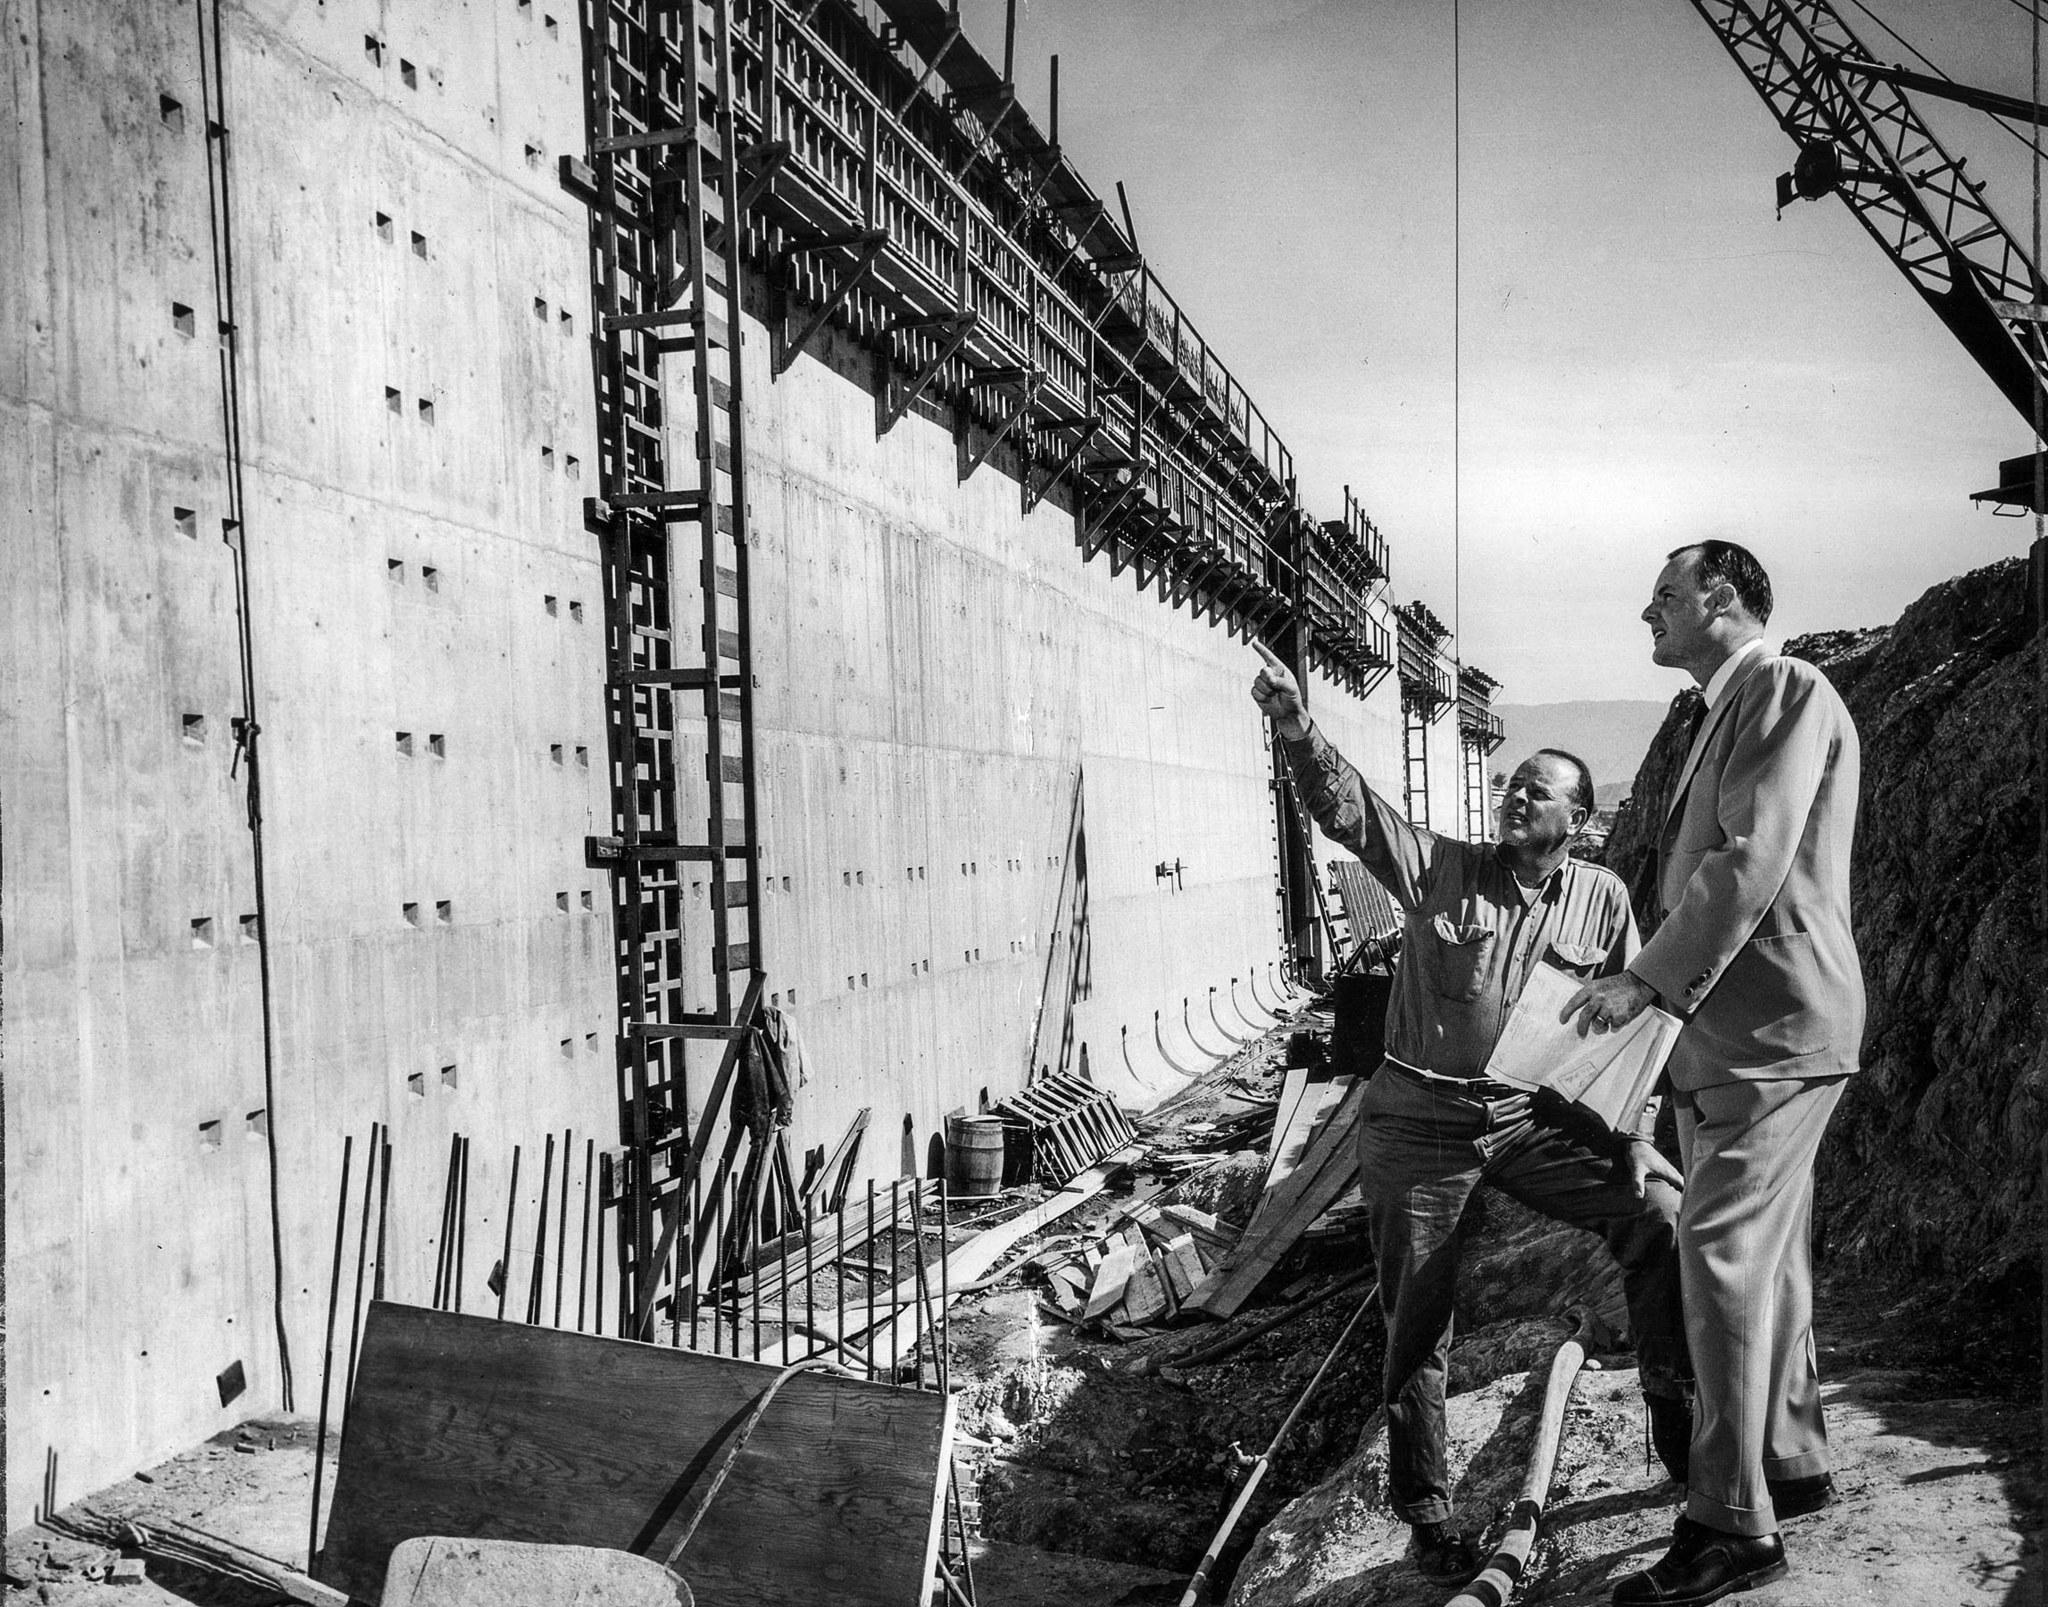 March 10, 1954: Contractor M. J. Brock Jr., left, and Superintendent Bill Lassetter check the progre